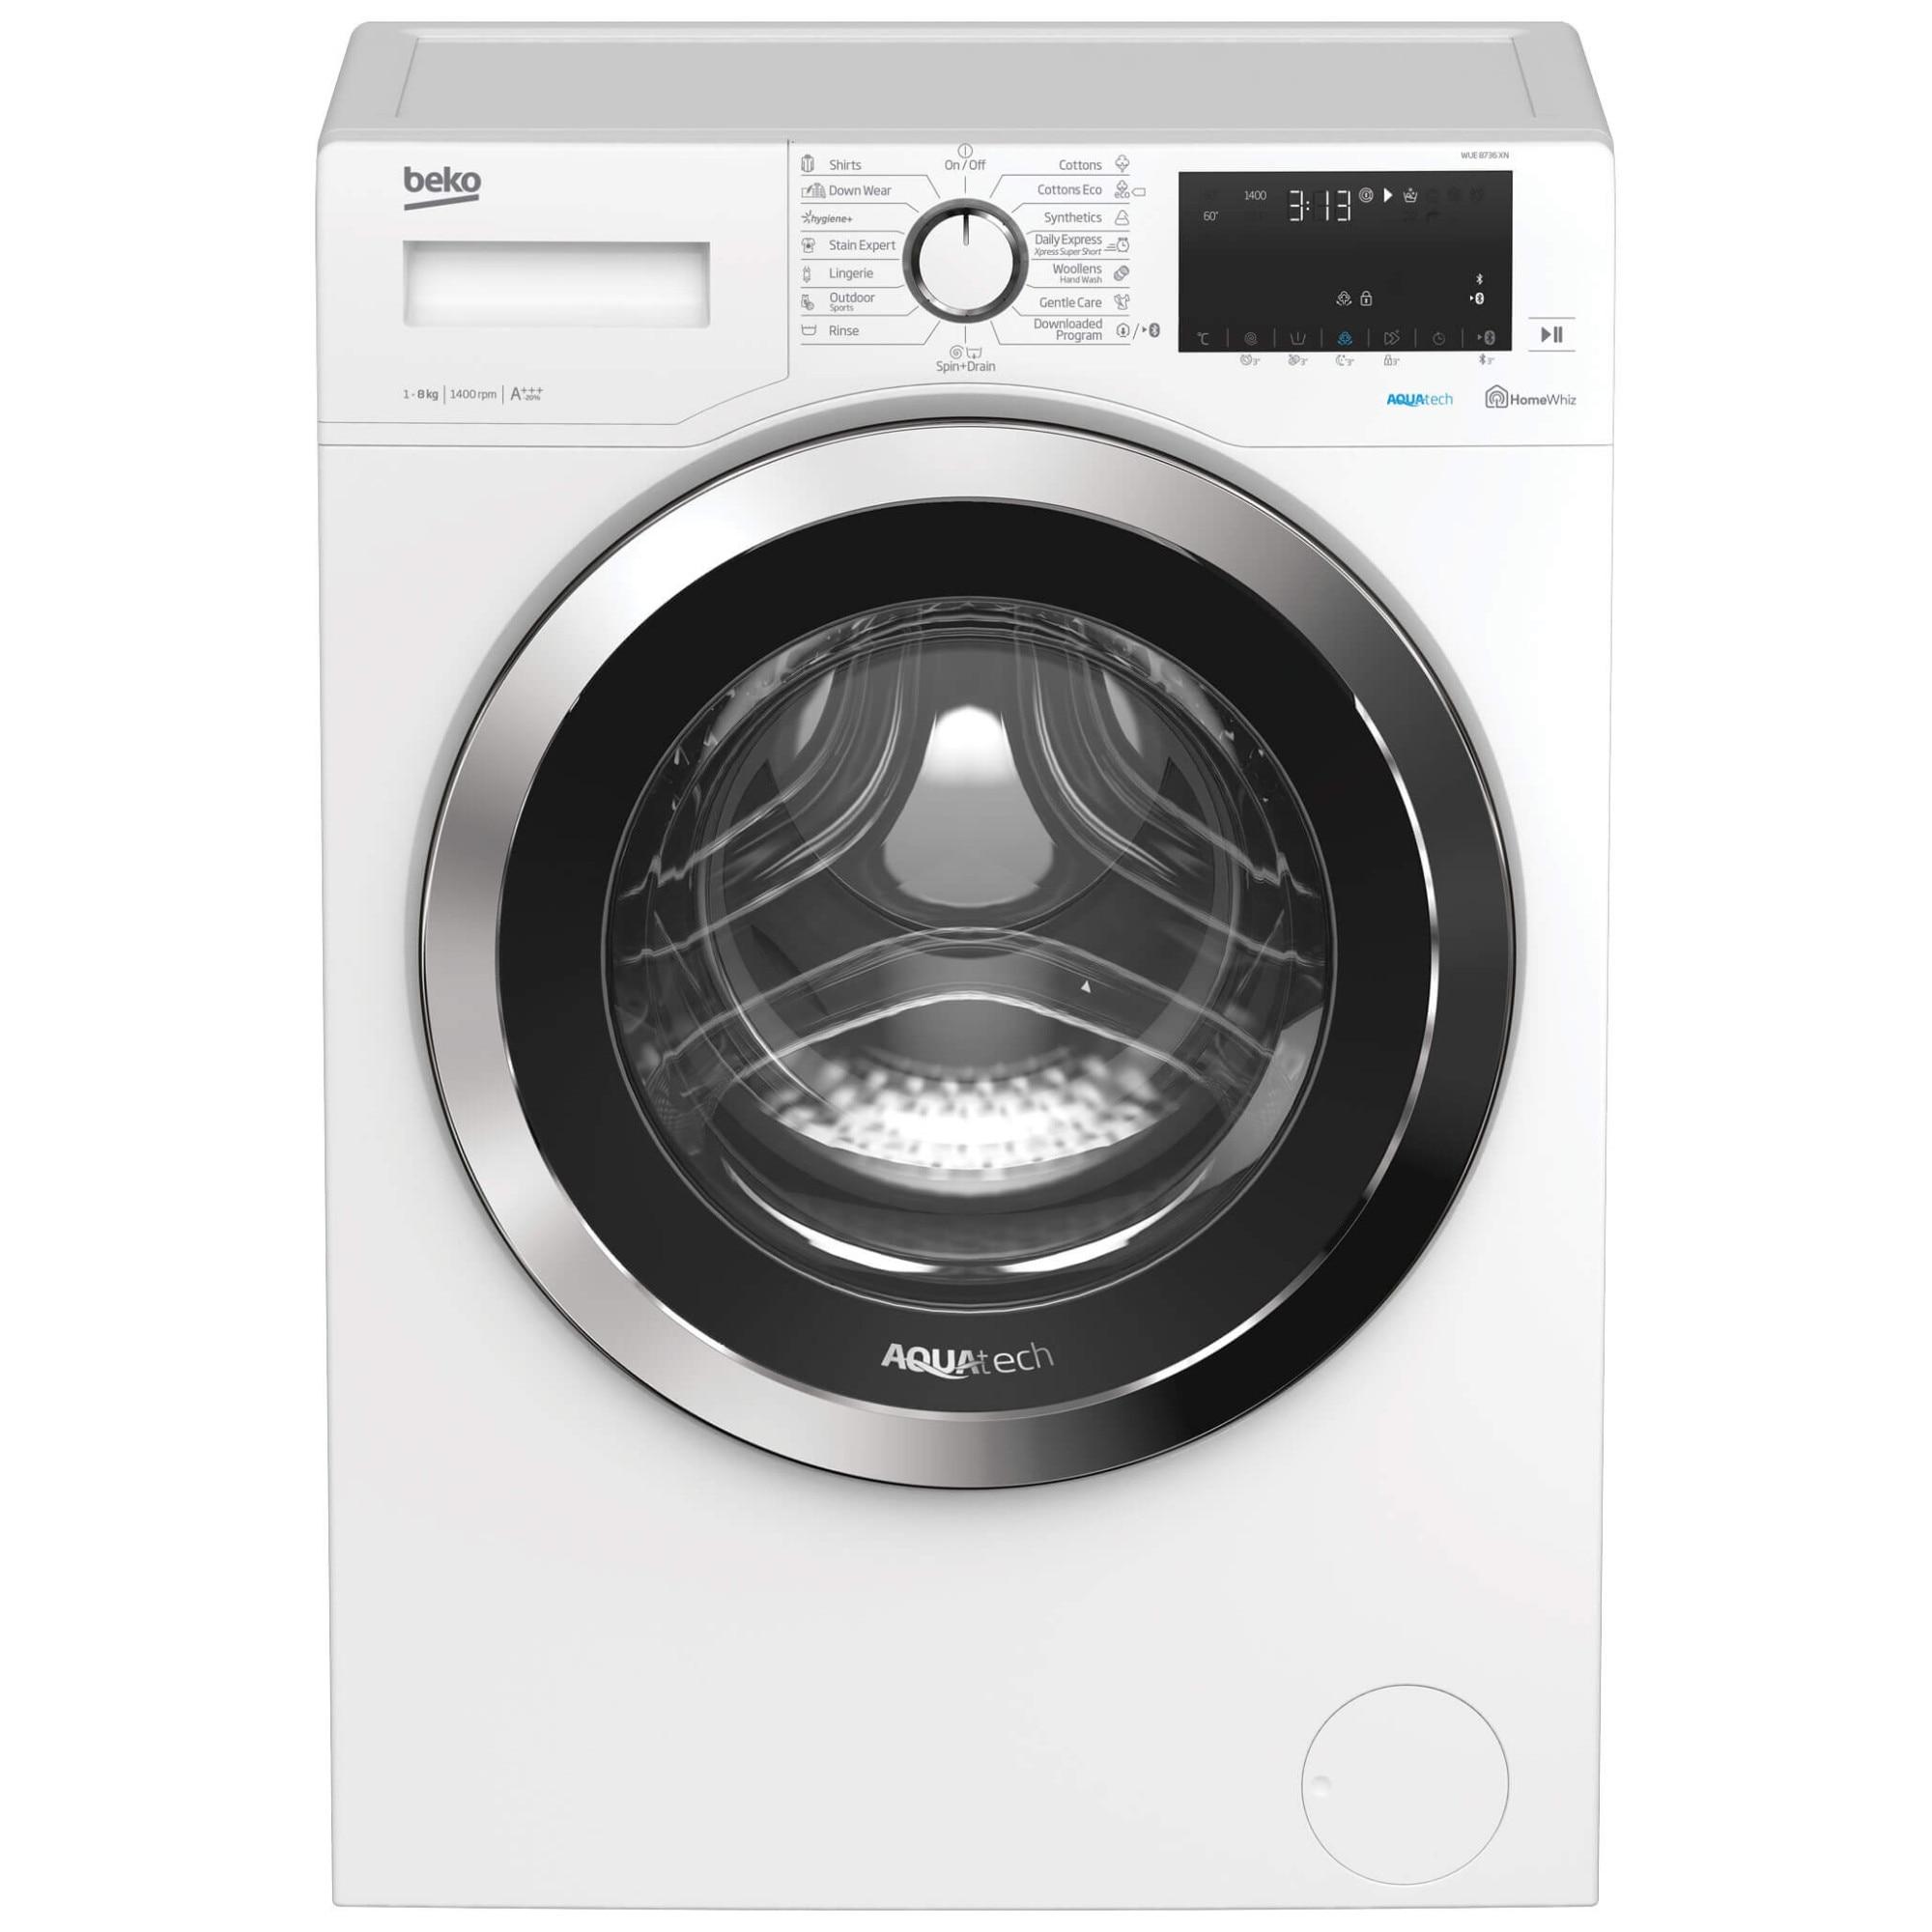 Fotografie Masina de spalat rufe Beko WUE8736XN, 8 kg, 1400 RPM, Clasa A, AquaTech, HomeWhiz, Bluetooth, SteamCure, Add Garment, Motor ProSmart Inverter, Hygiene, Alb